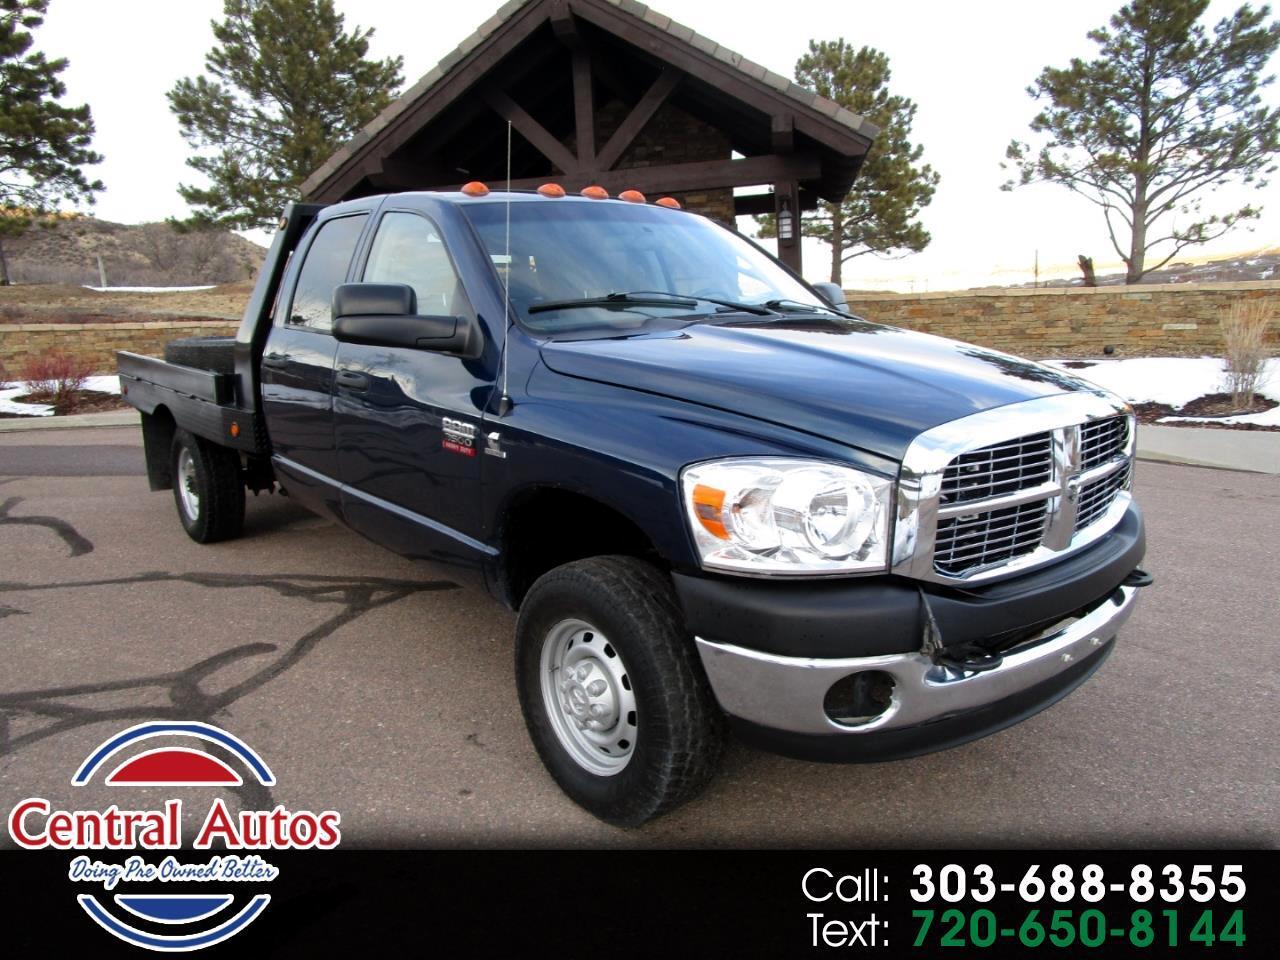 "2007 Dodge Ram 3500 4WD Quad Cab 60"" CA 163.5"" WB"